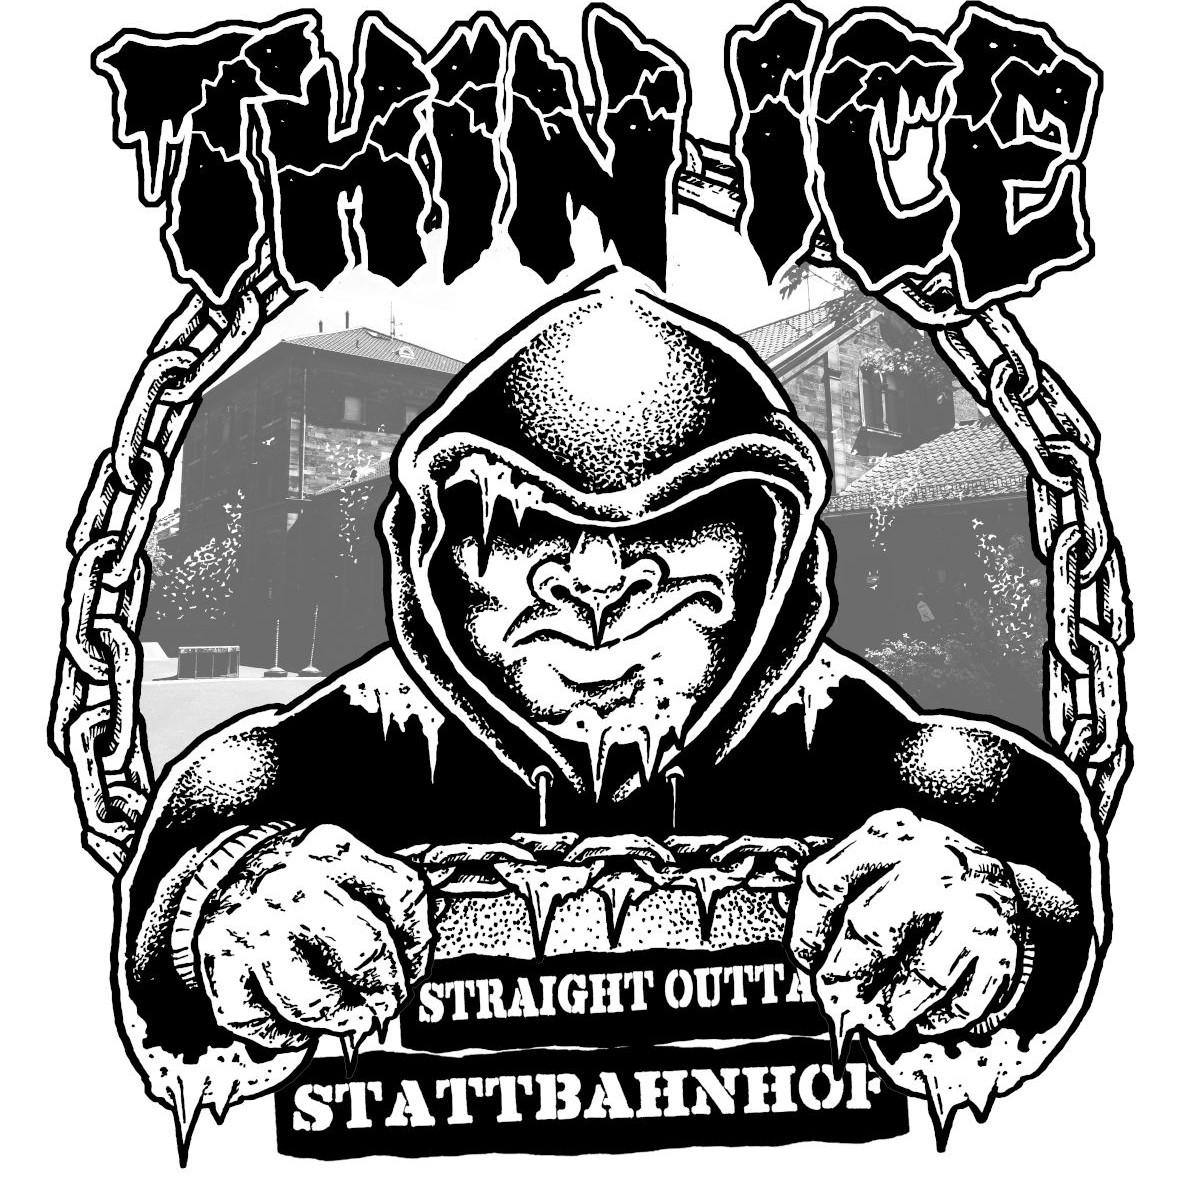 Thin Ice - Straight Outta Stattbahnhof [T-Shirt] (Artwork)